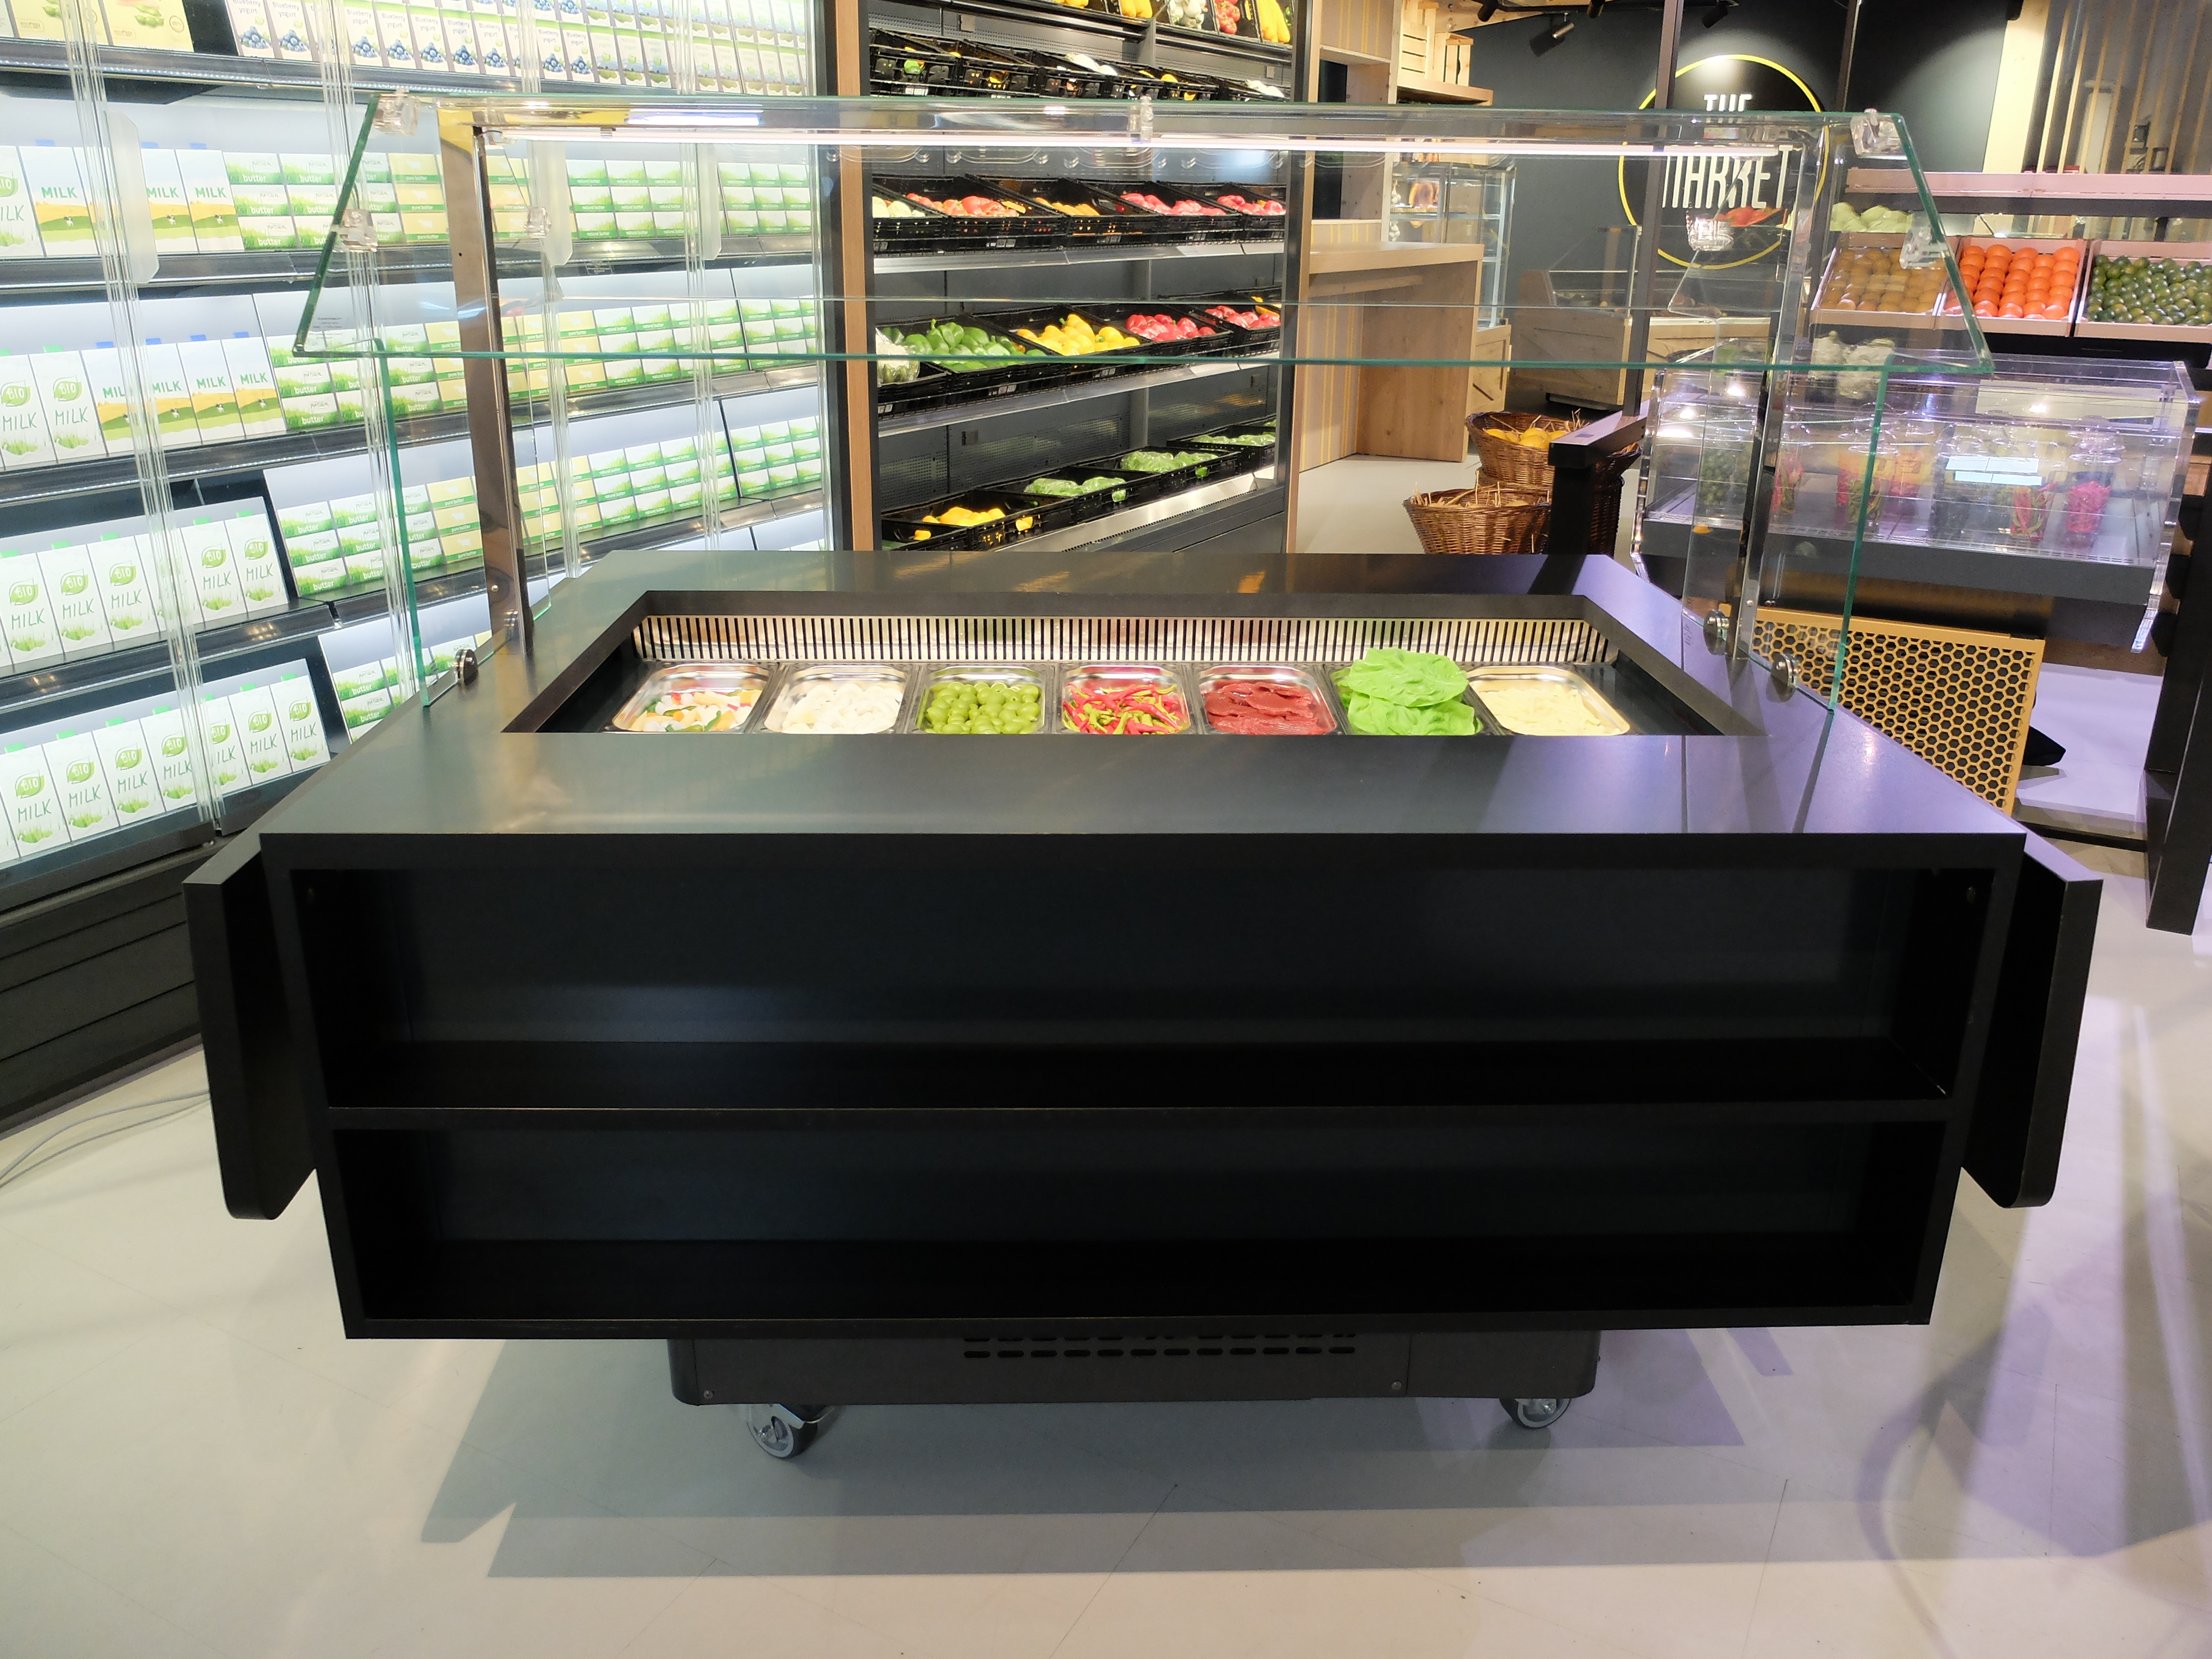 plug-in-island-multinor_salad_bar-products